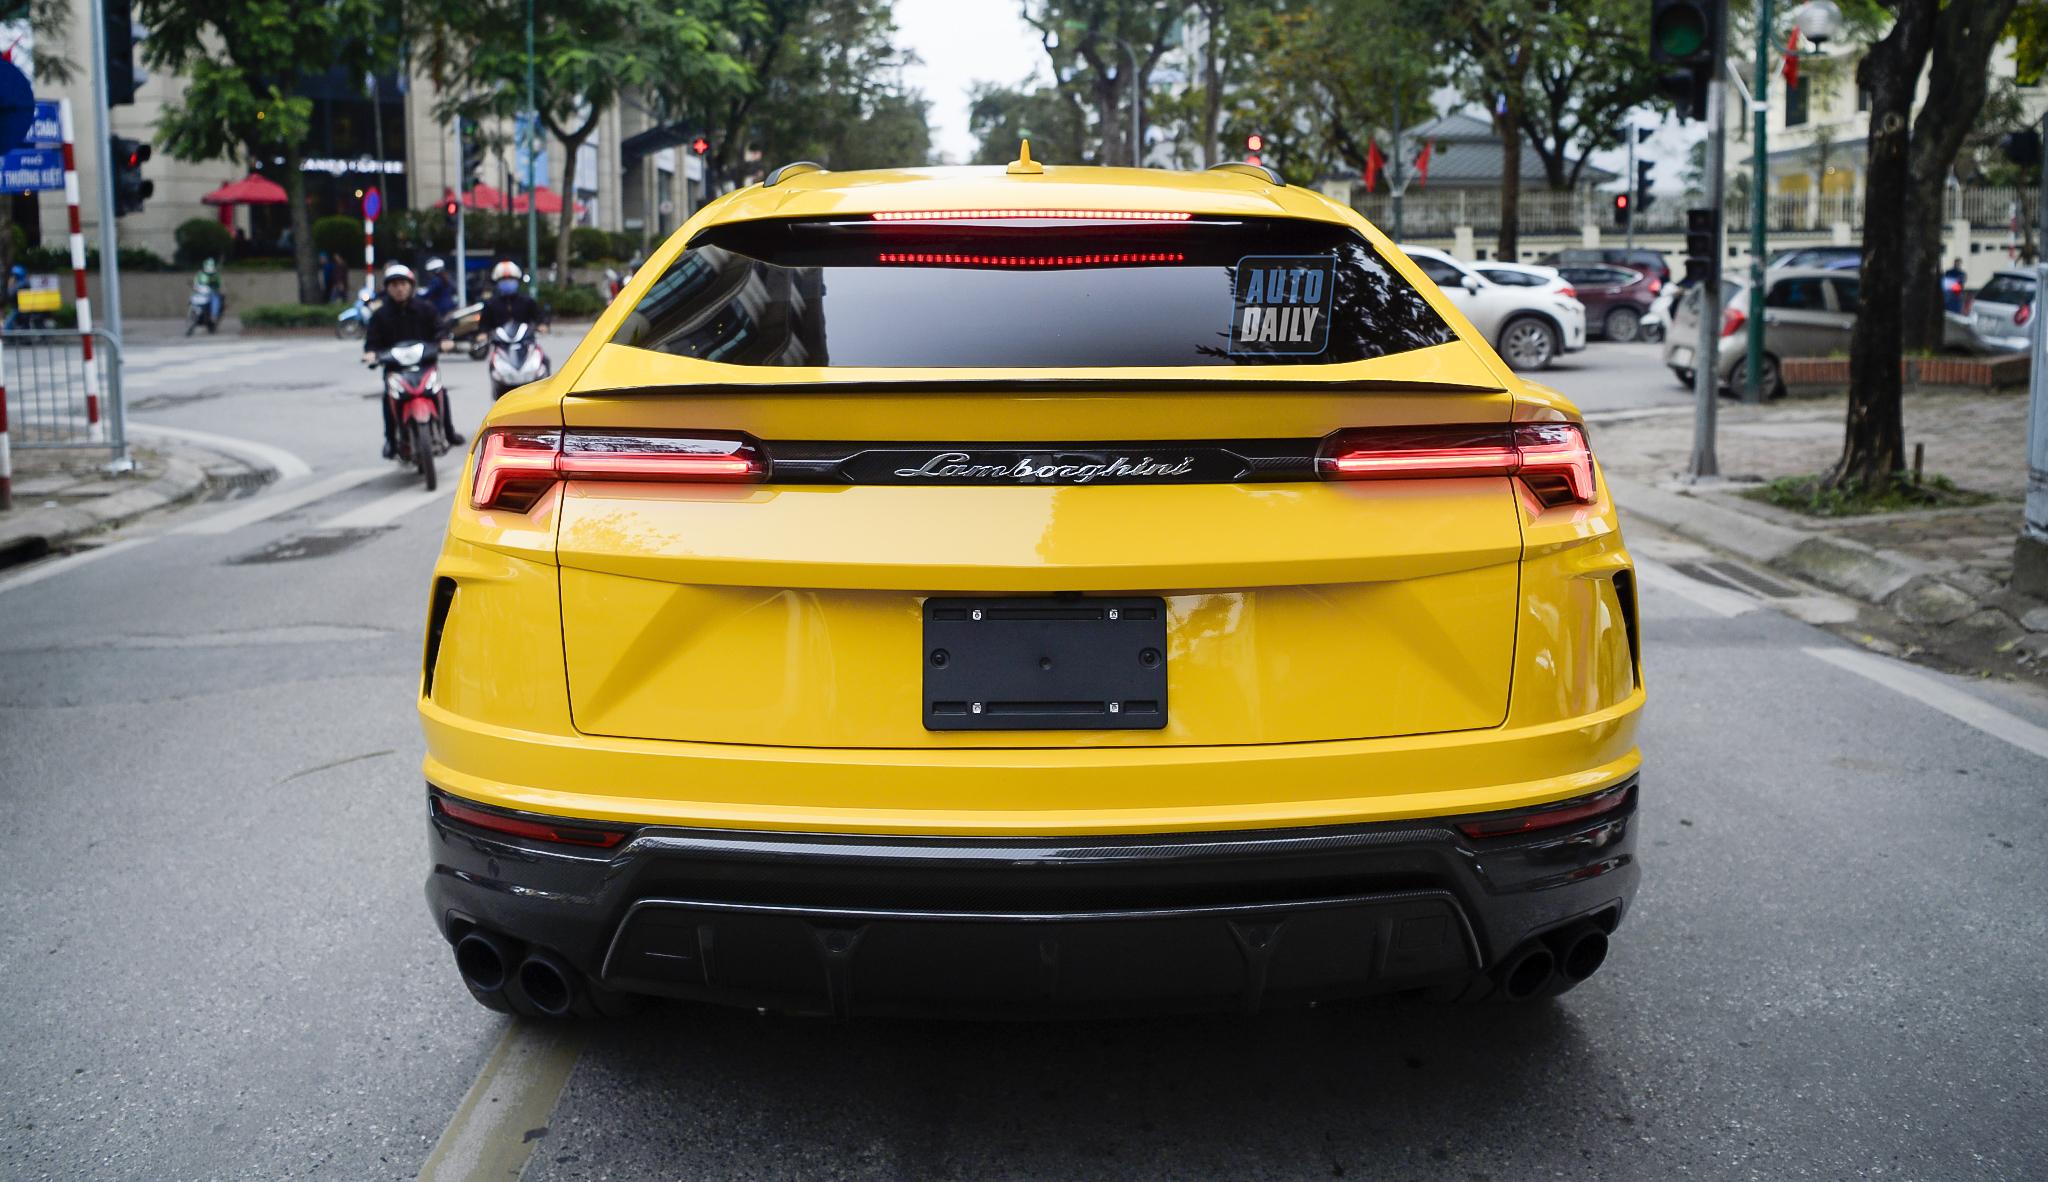 Siêu SUV Lamborghini Urus giá triệu USD của thiếu gia nhà bầu Hiển